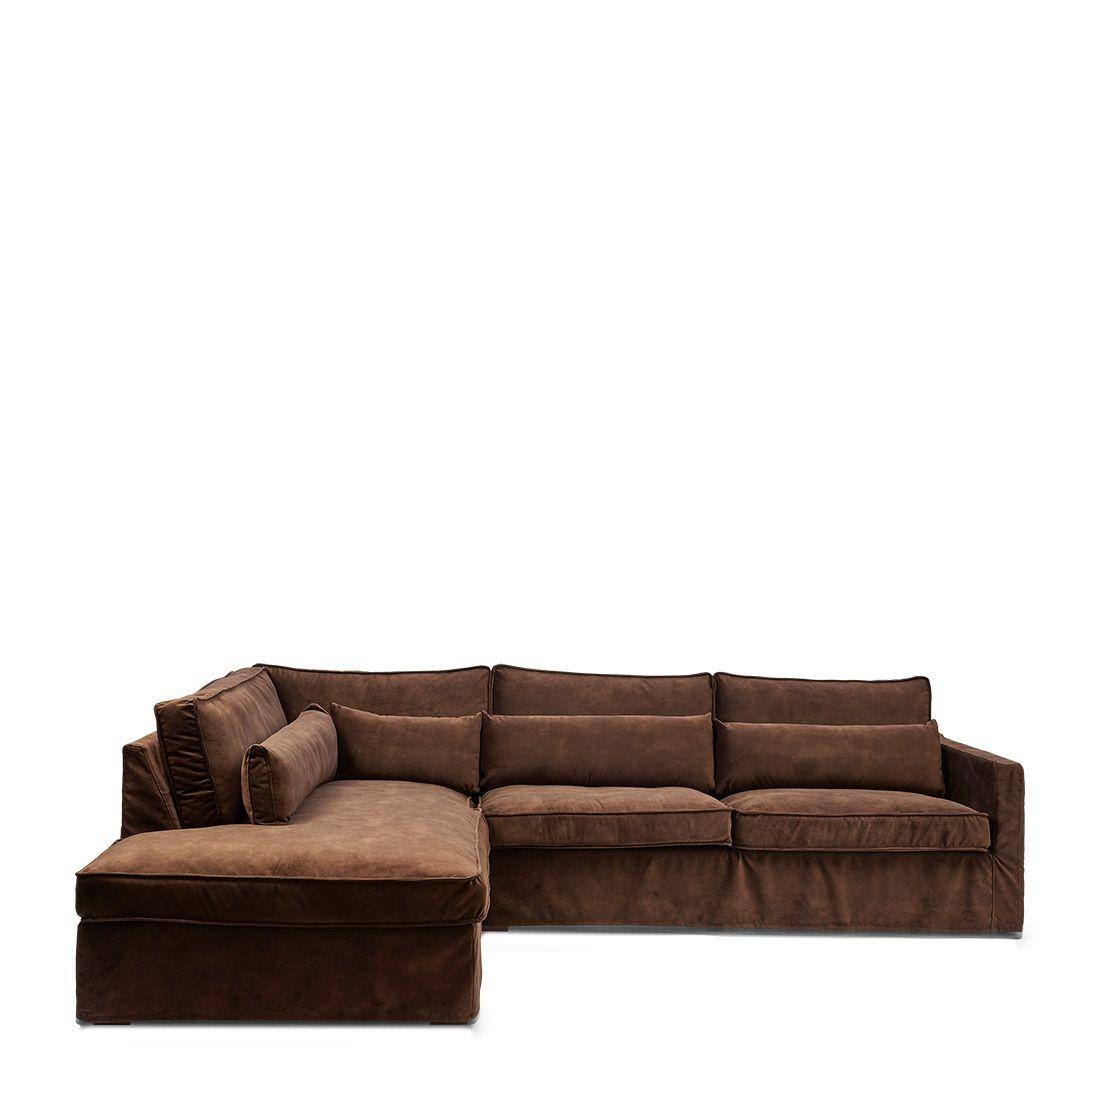 Brompton Cross Corner Sofa Chaise Longue Left velvet chocolate / Rivièra Maison